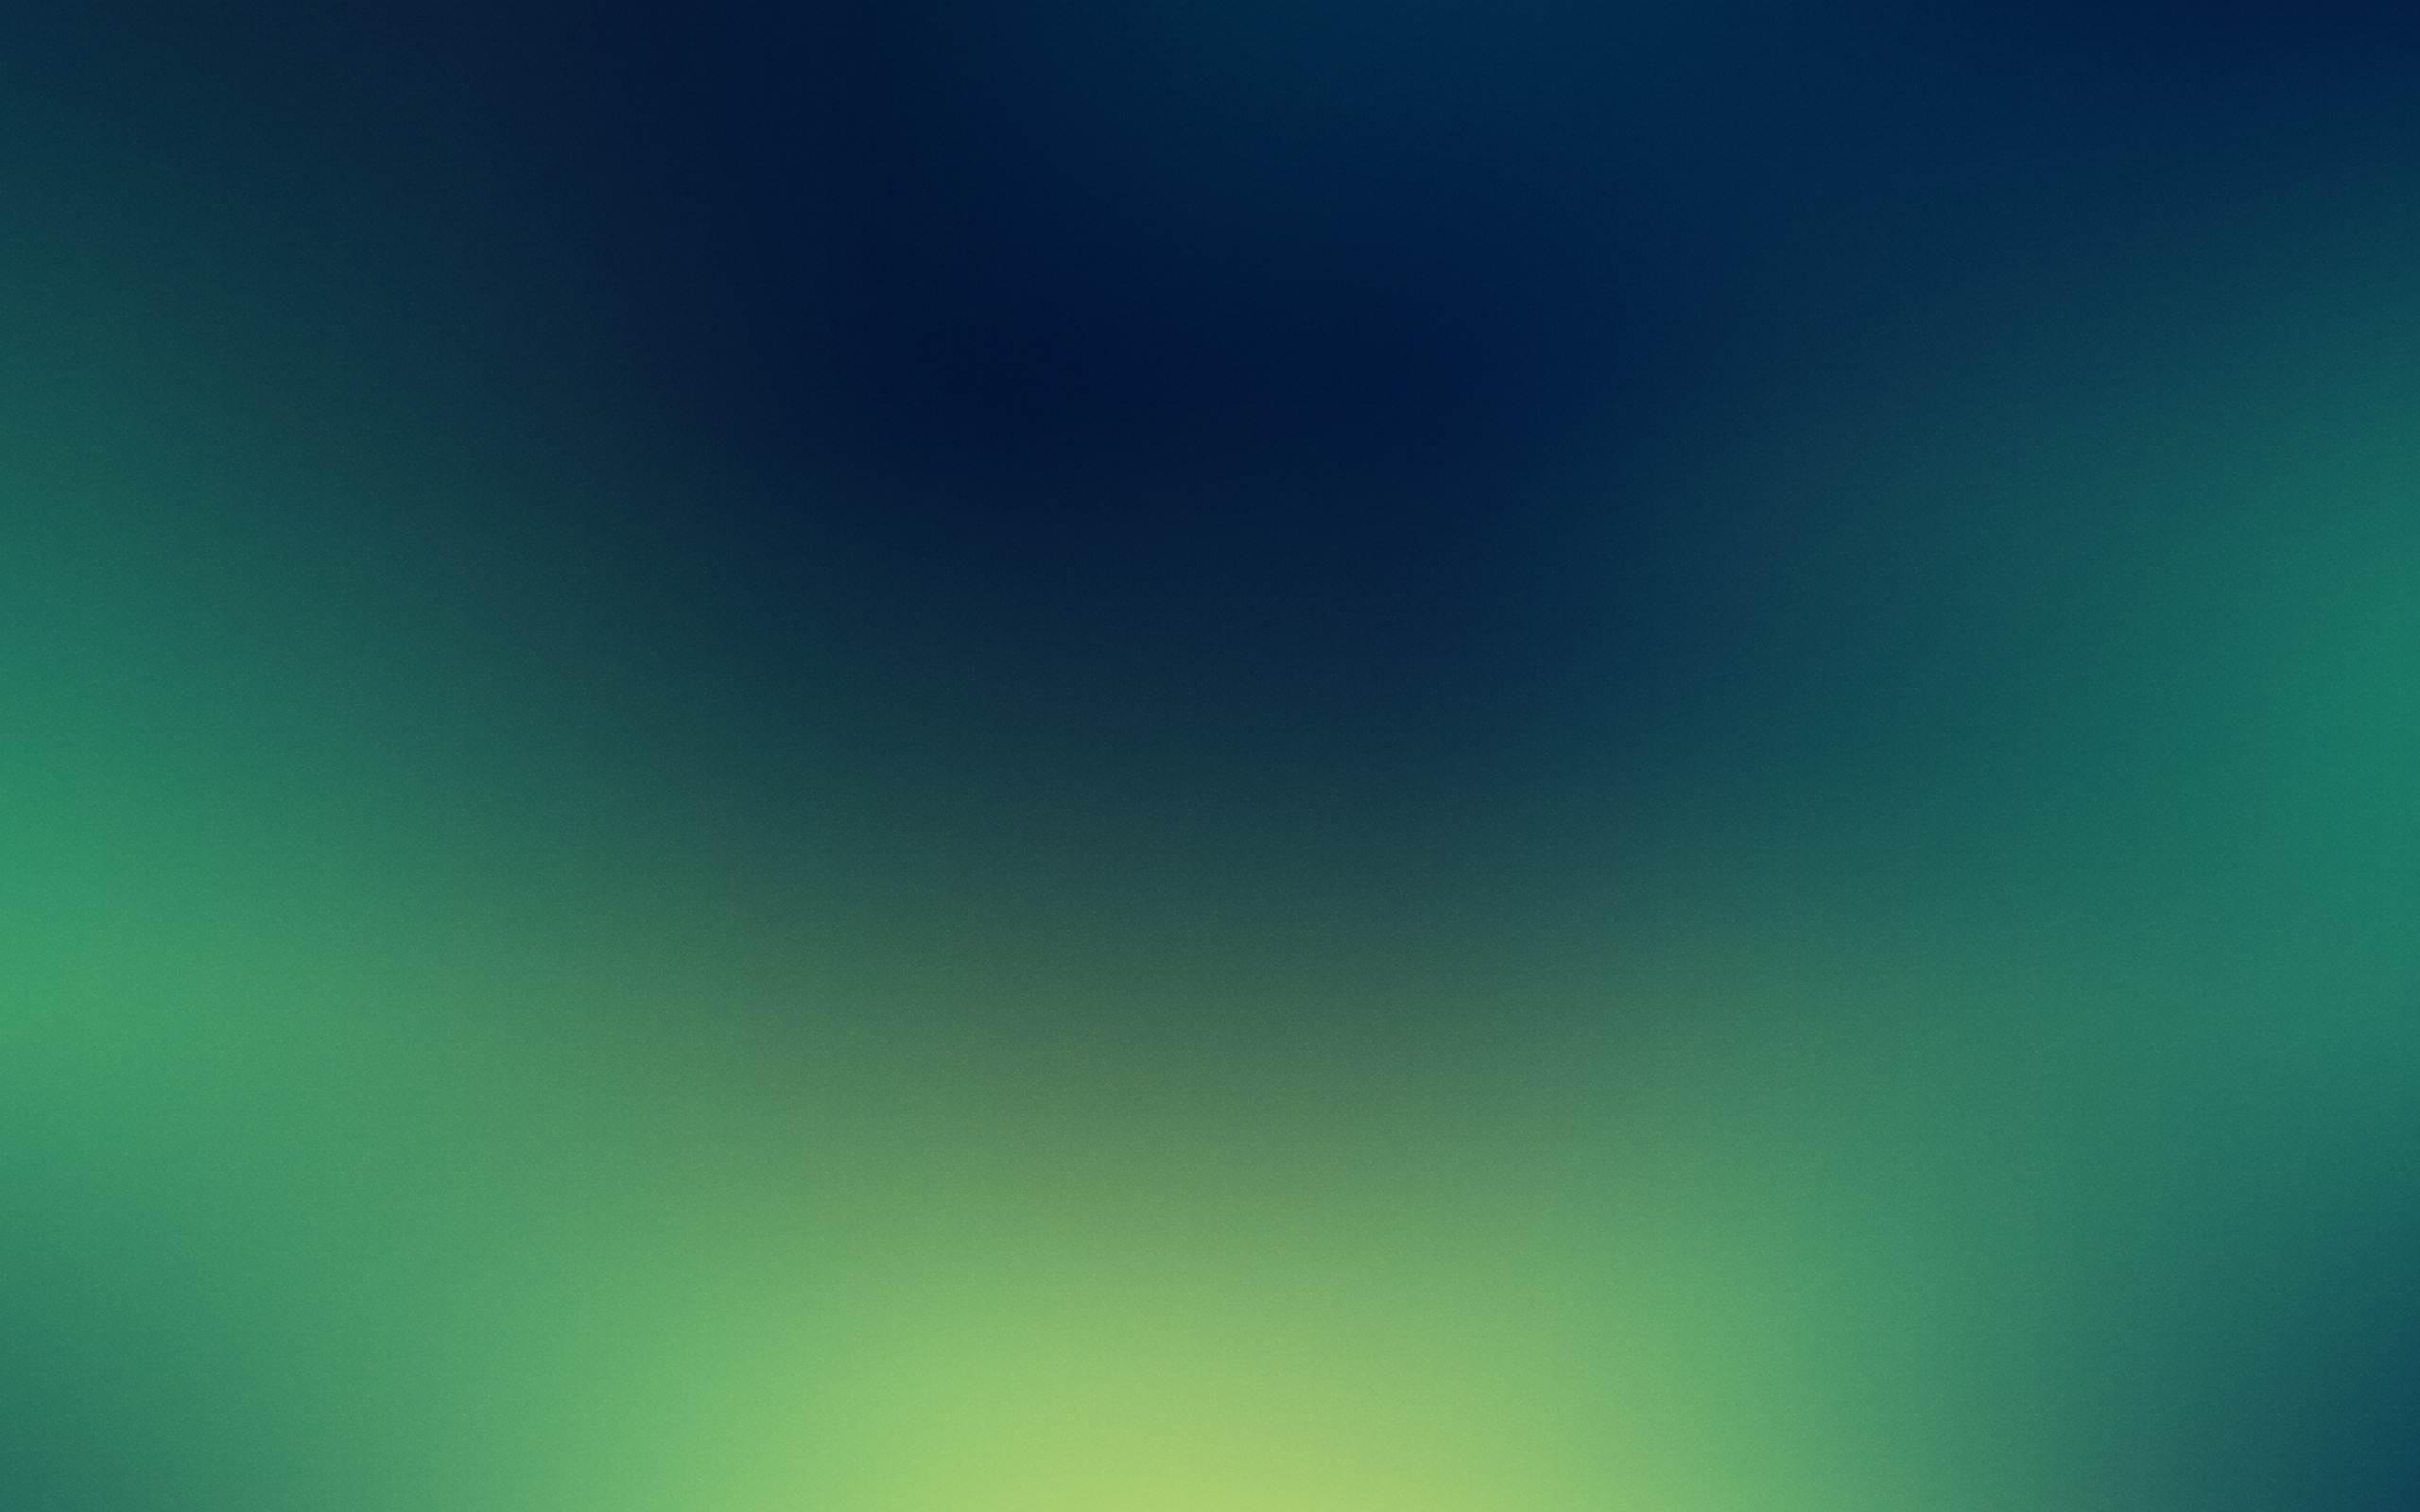 Res: 2560x1600, Wallpapers Backgrounds - Tissot T049 410 053 100 Black Men Watch